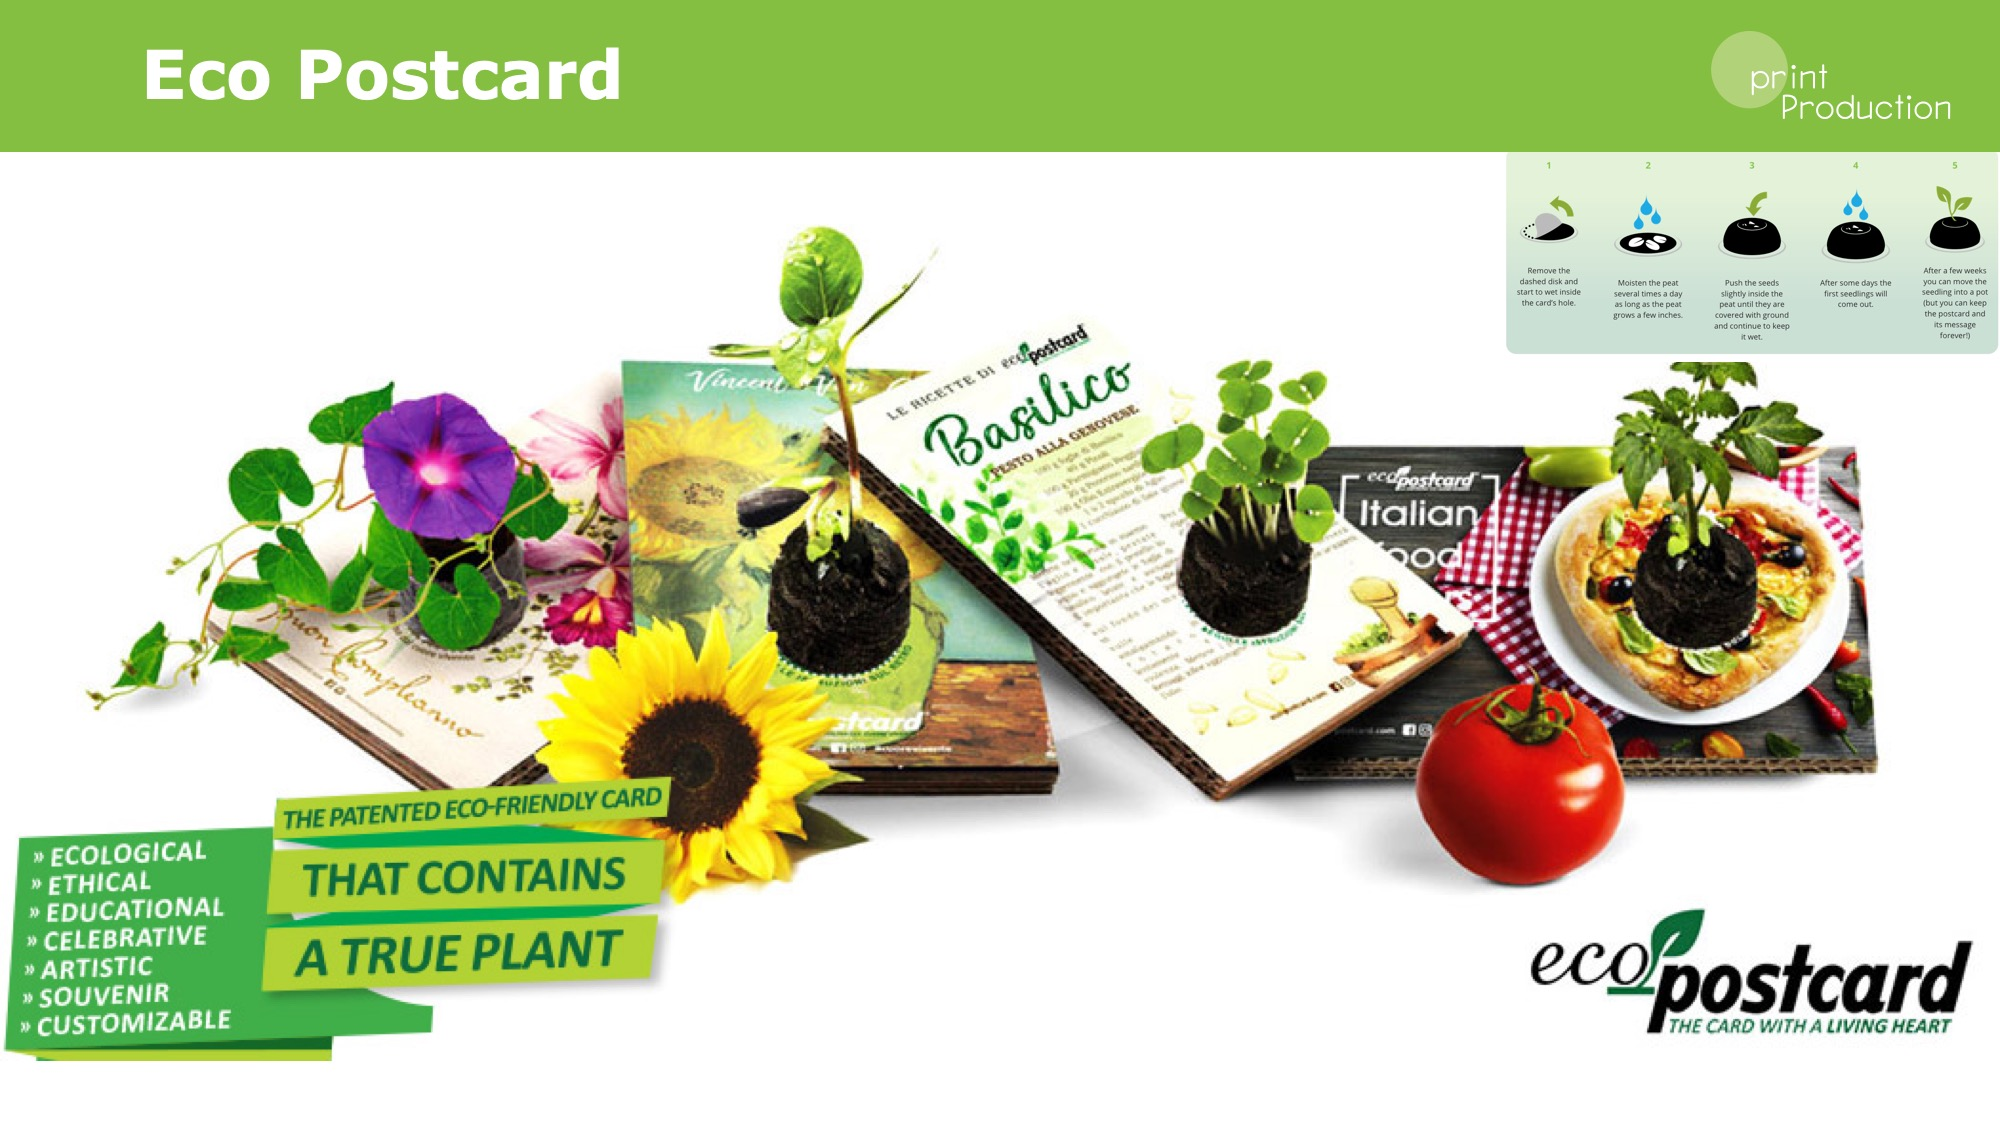 Eco postcard